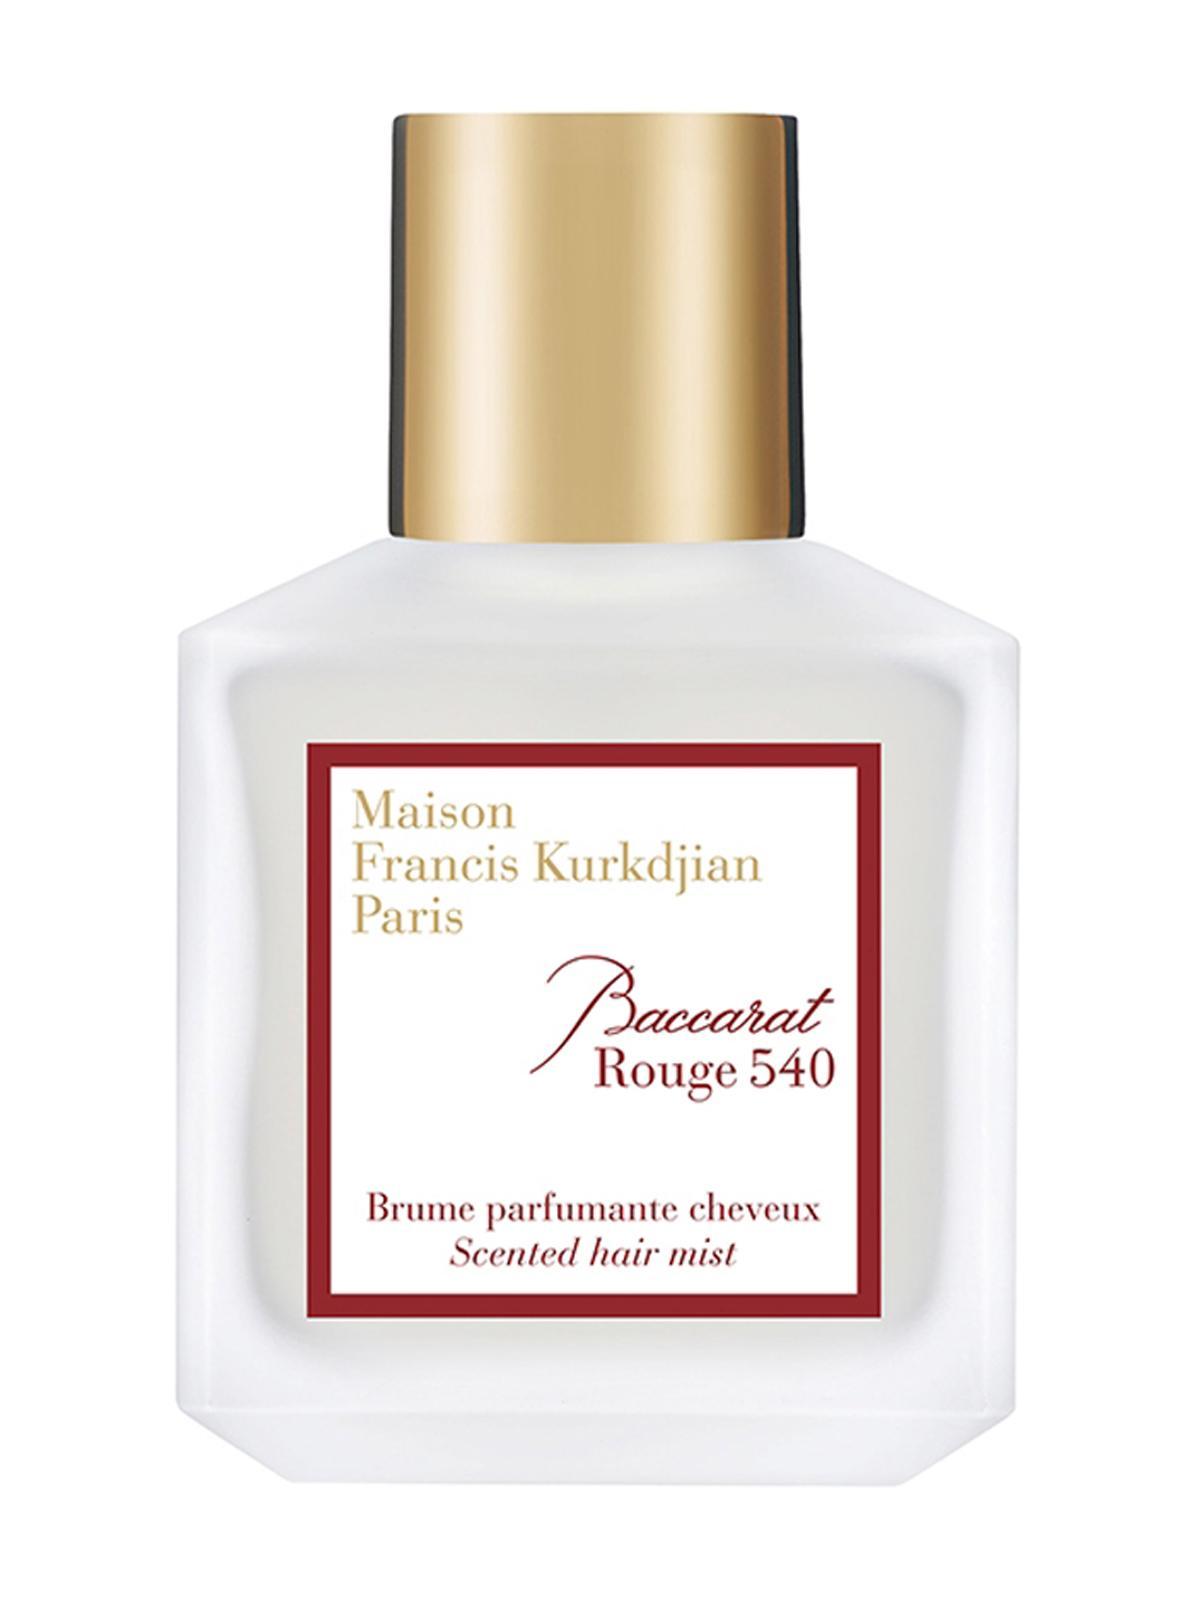 Francis Kurkdjian Baccarat Rouge 540 Hair Mist 70ML